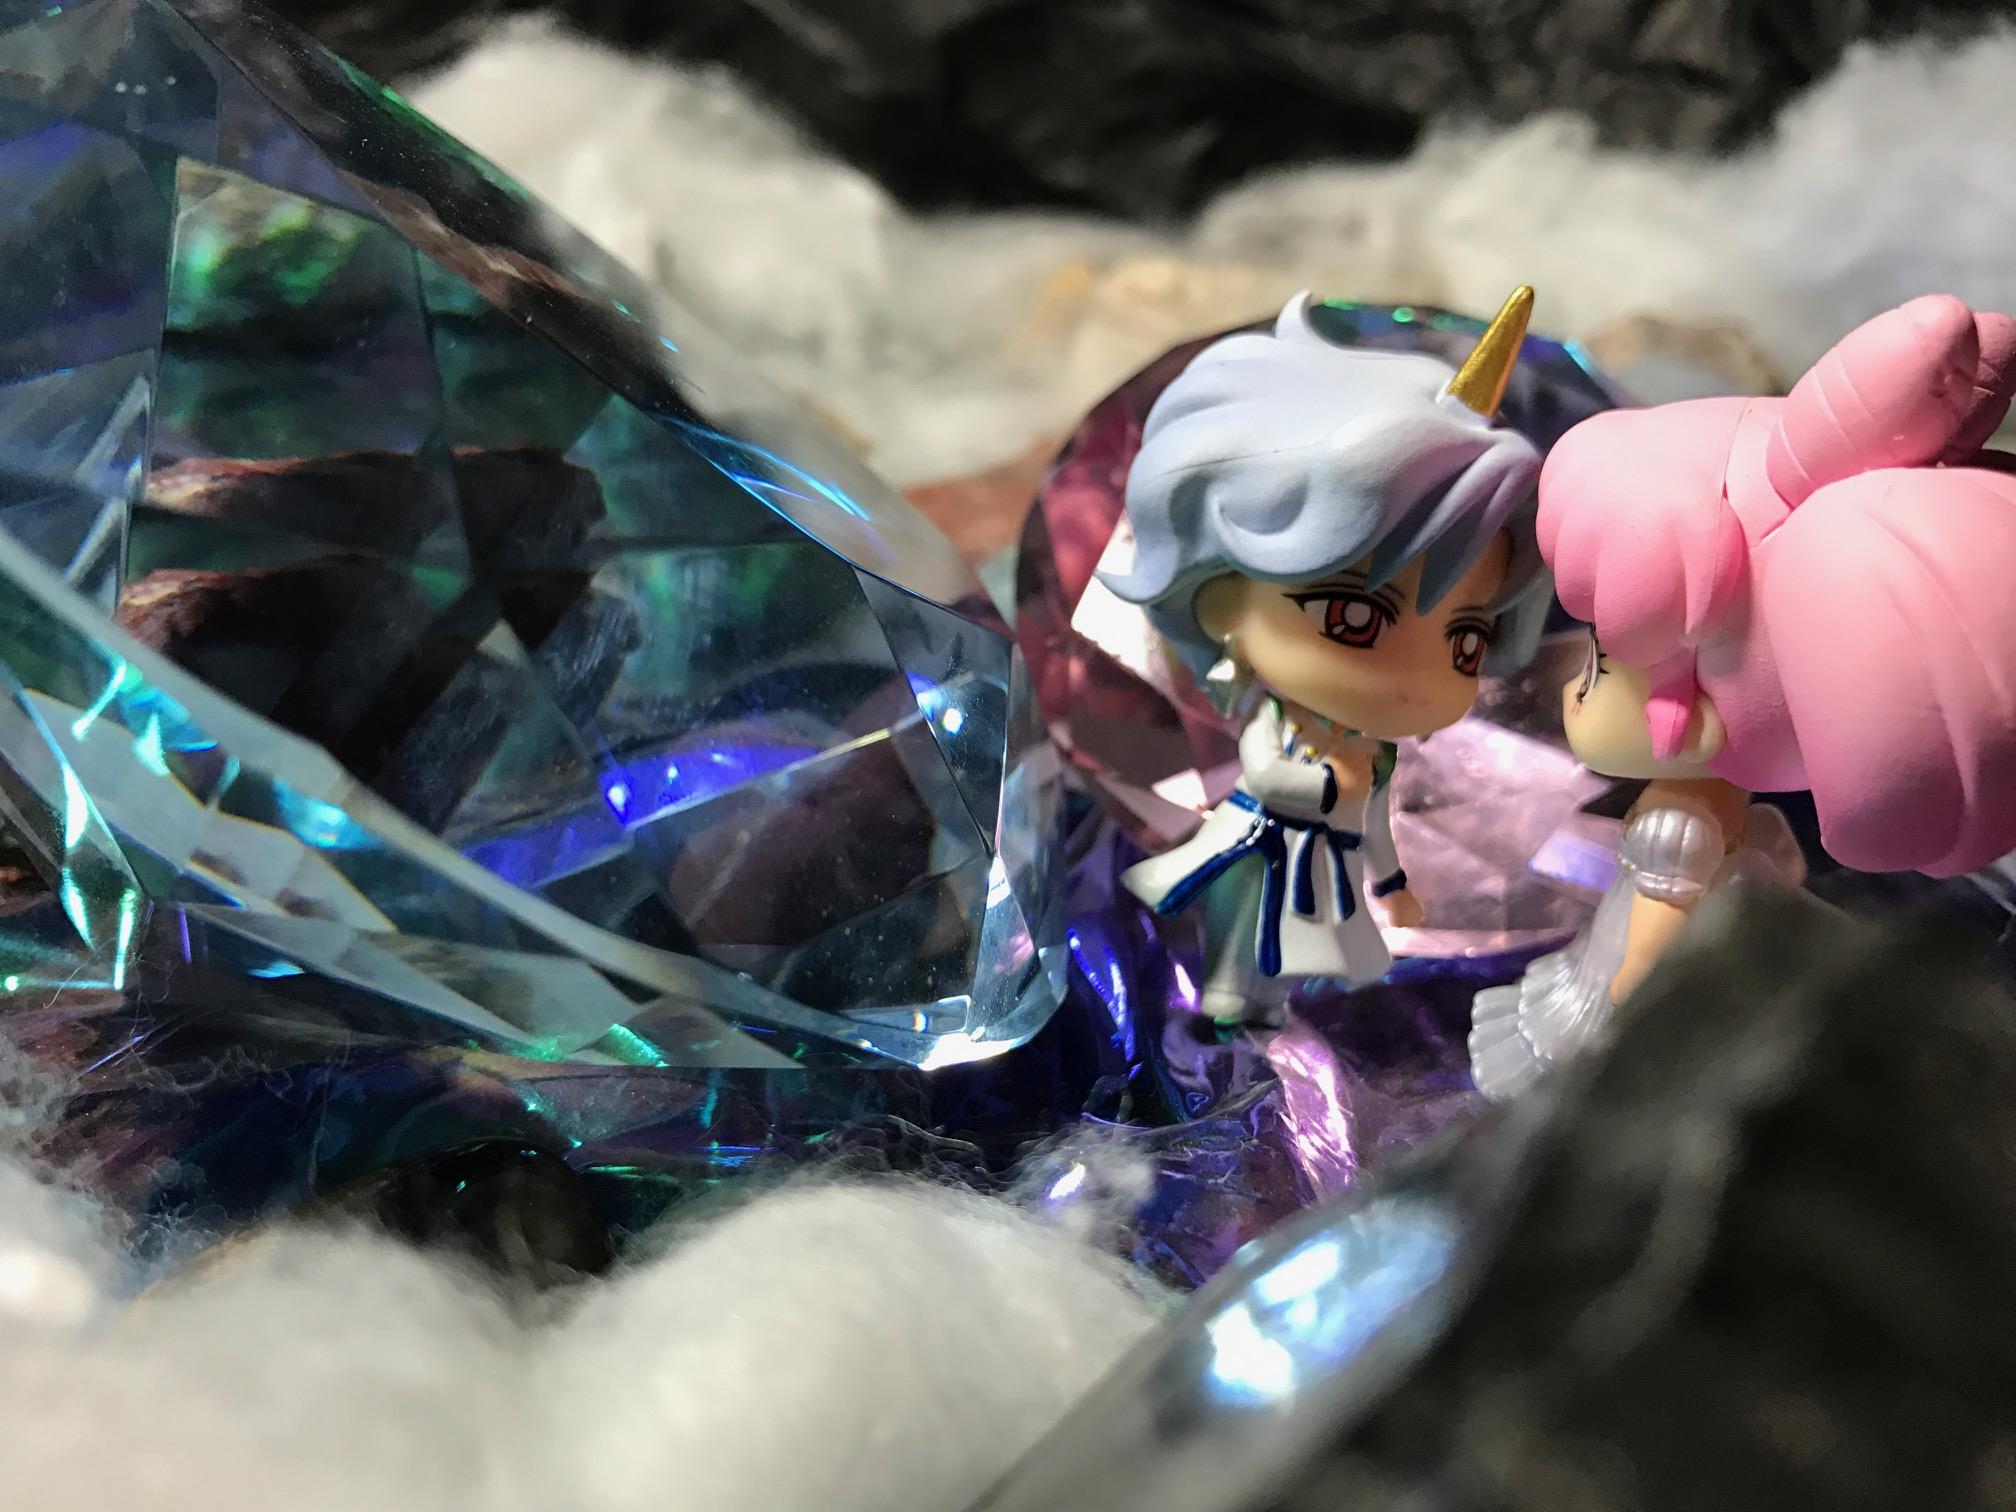 petit_chara!_bishoujo_senshi_sailor_moon_supers_hen petit_chara!_series bishoujo_senshi_sailor_moon_supers toei_animation takeuchi_naoko megahouse princess_usagi_small_lady_serenity helios